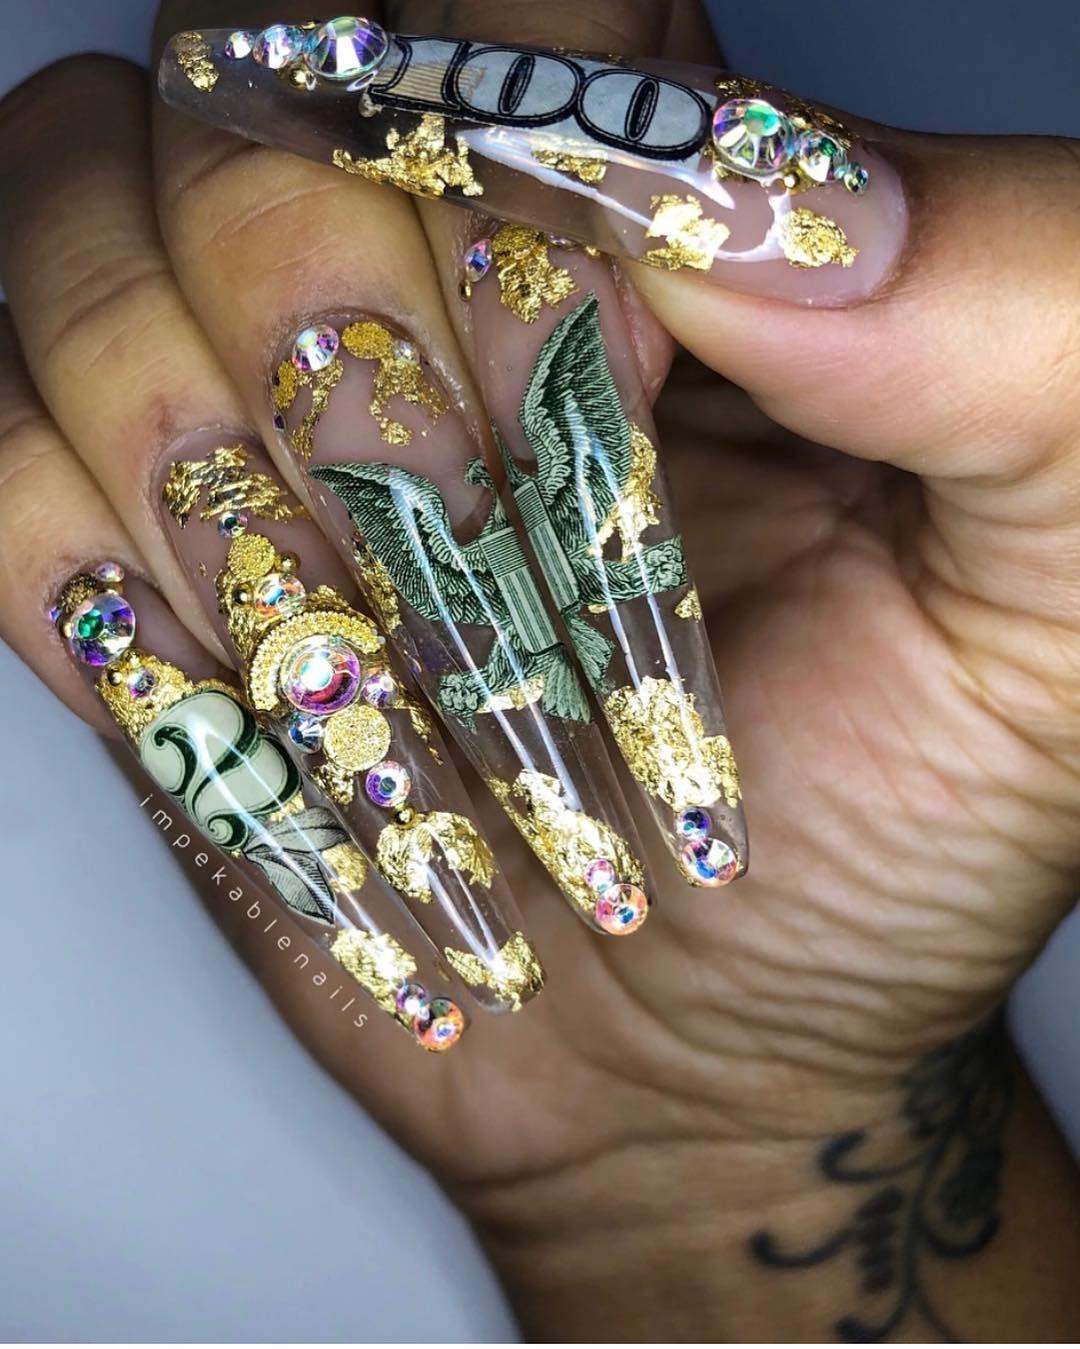 Extra Long Almond Nails With 100 Dollar Designs Money Designs On Almond Nails Long Almond Nails Ghetto Nails Long Acrylic Nails